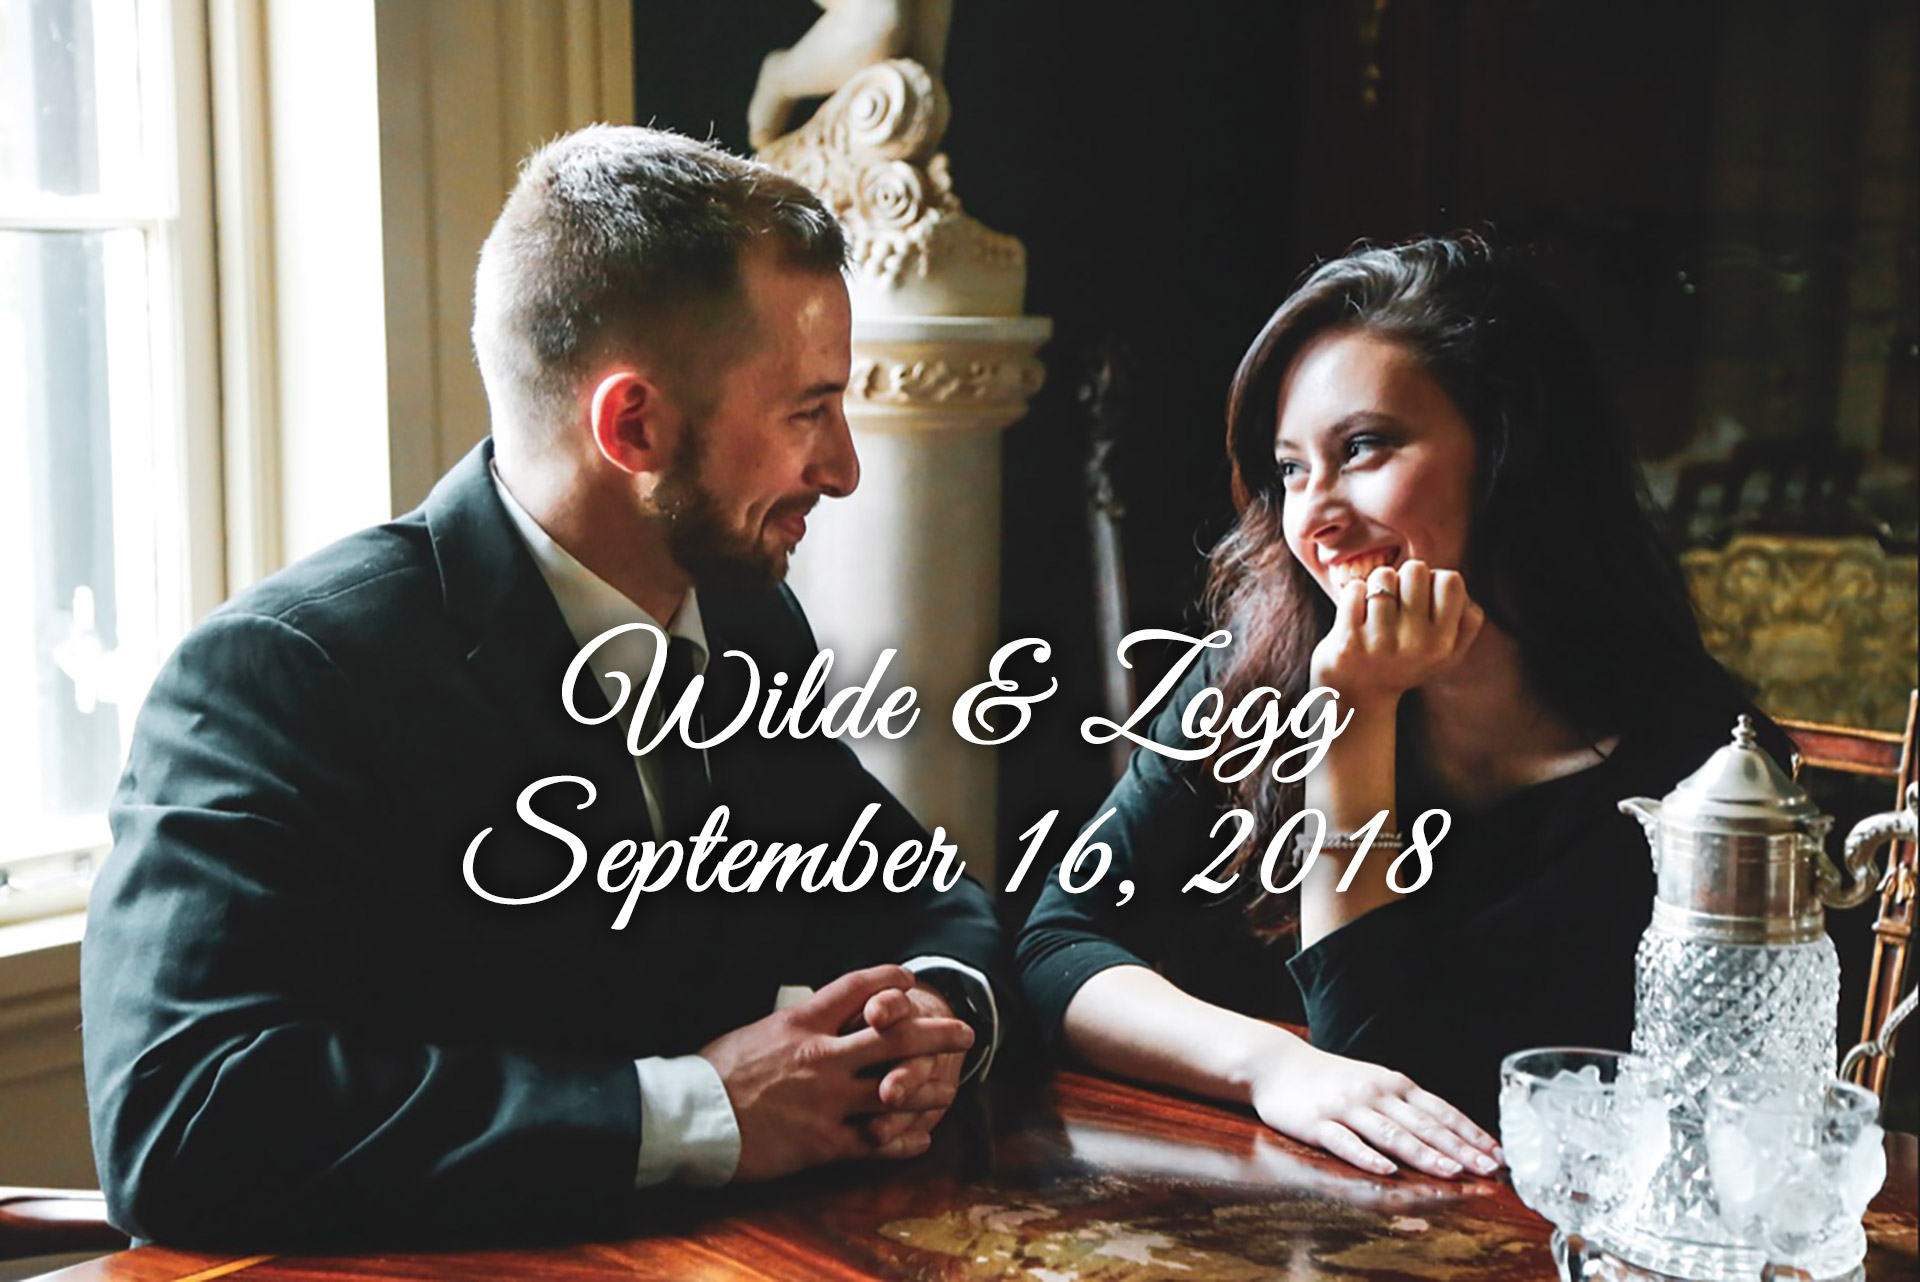 Zogg-Wilde Remnant Fellowship Wedding